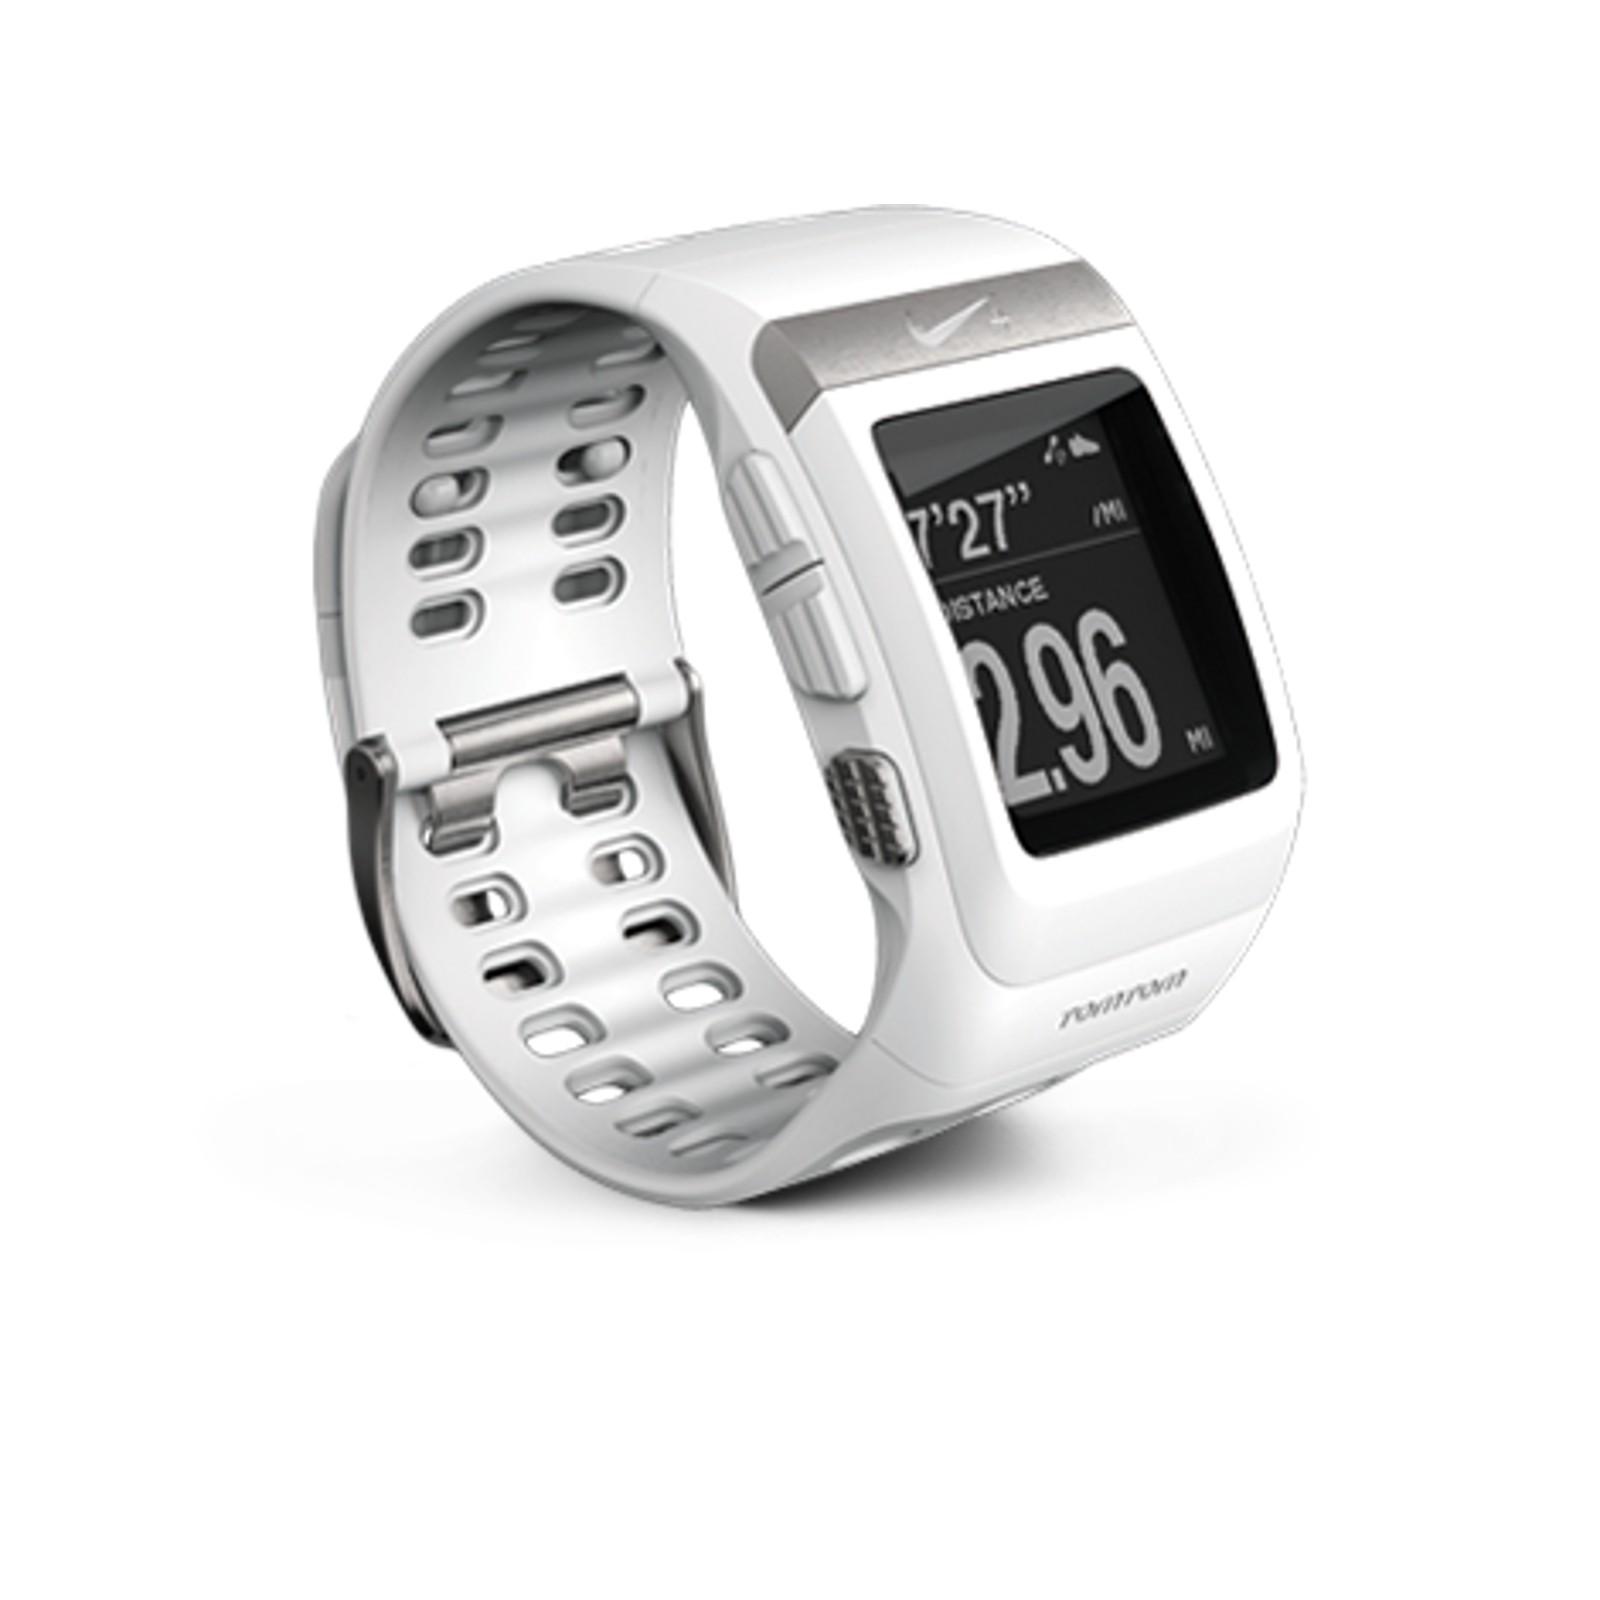 Nike Watches - GPS, Sports, Plus, Running, New, Used | eBay